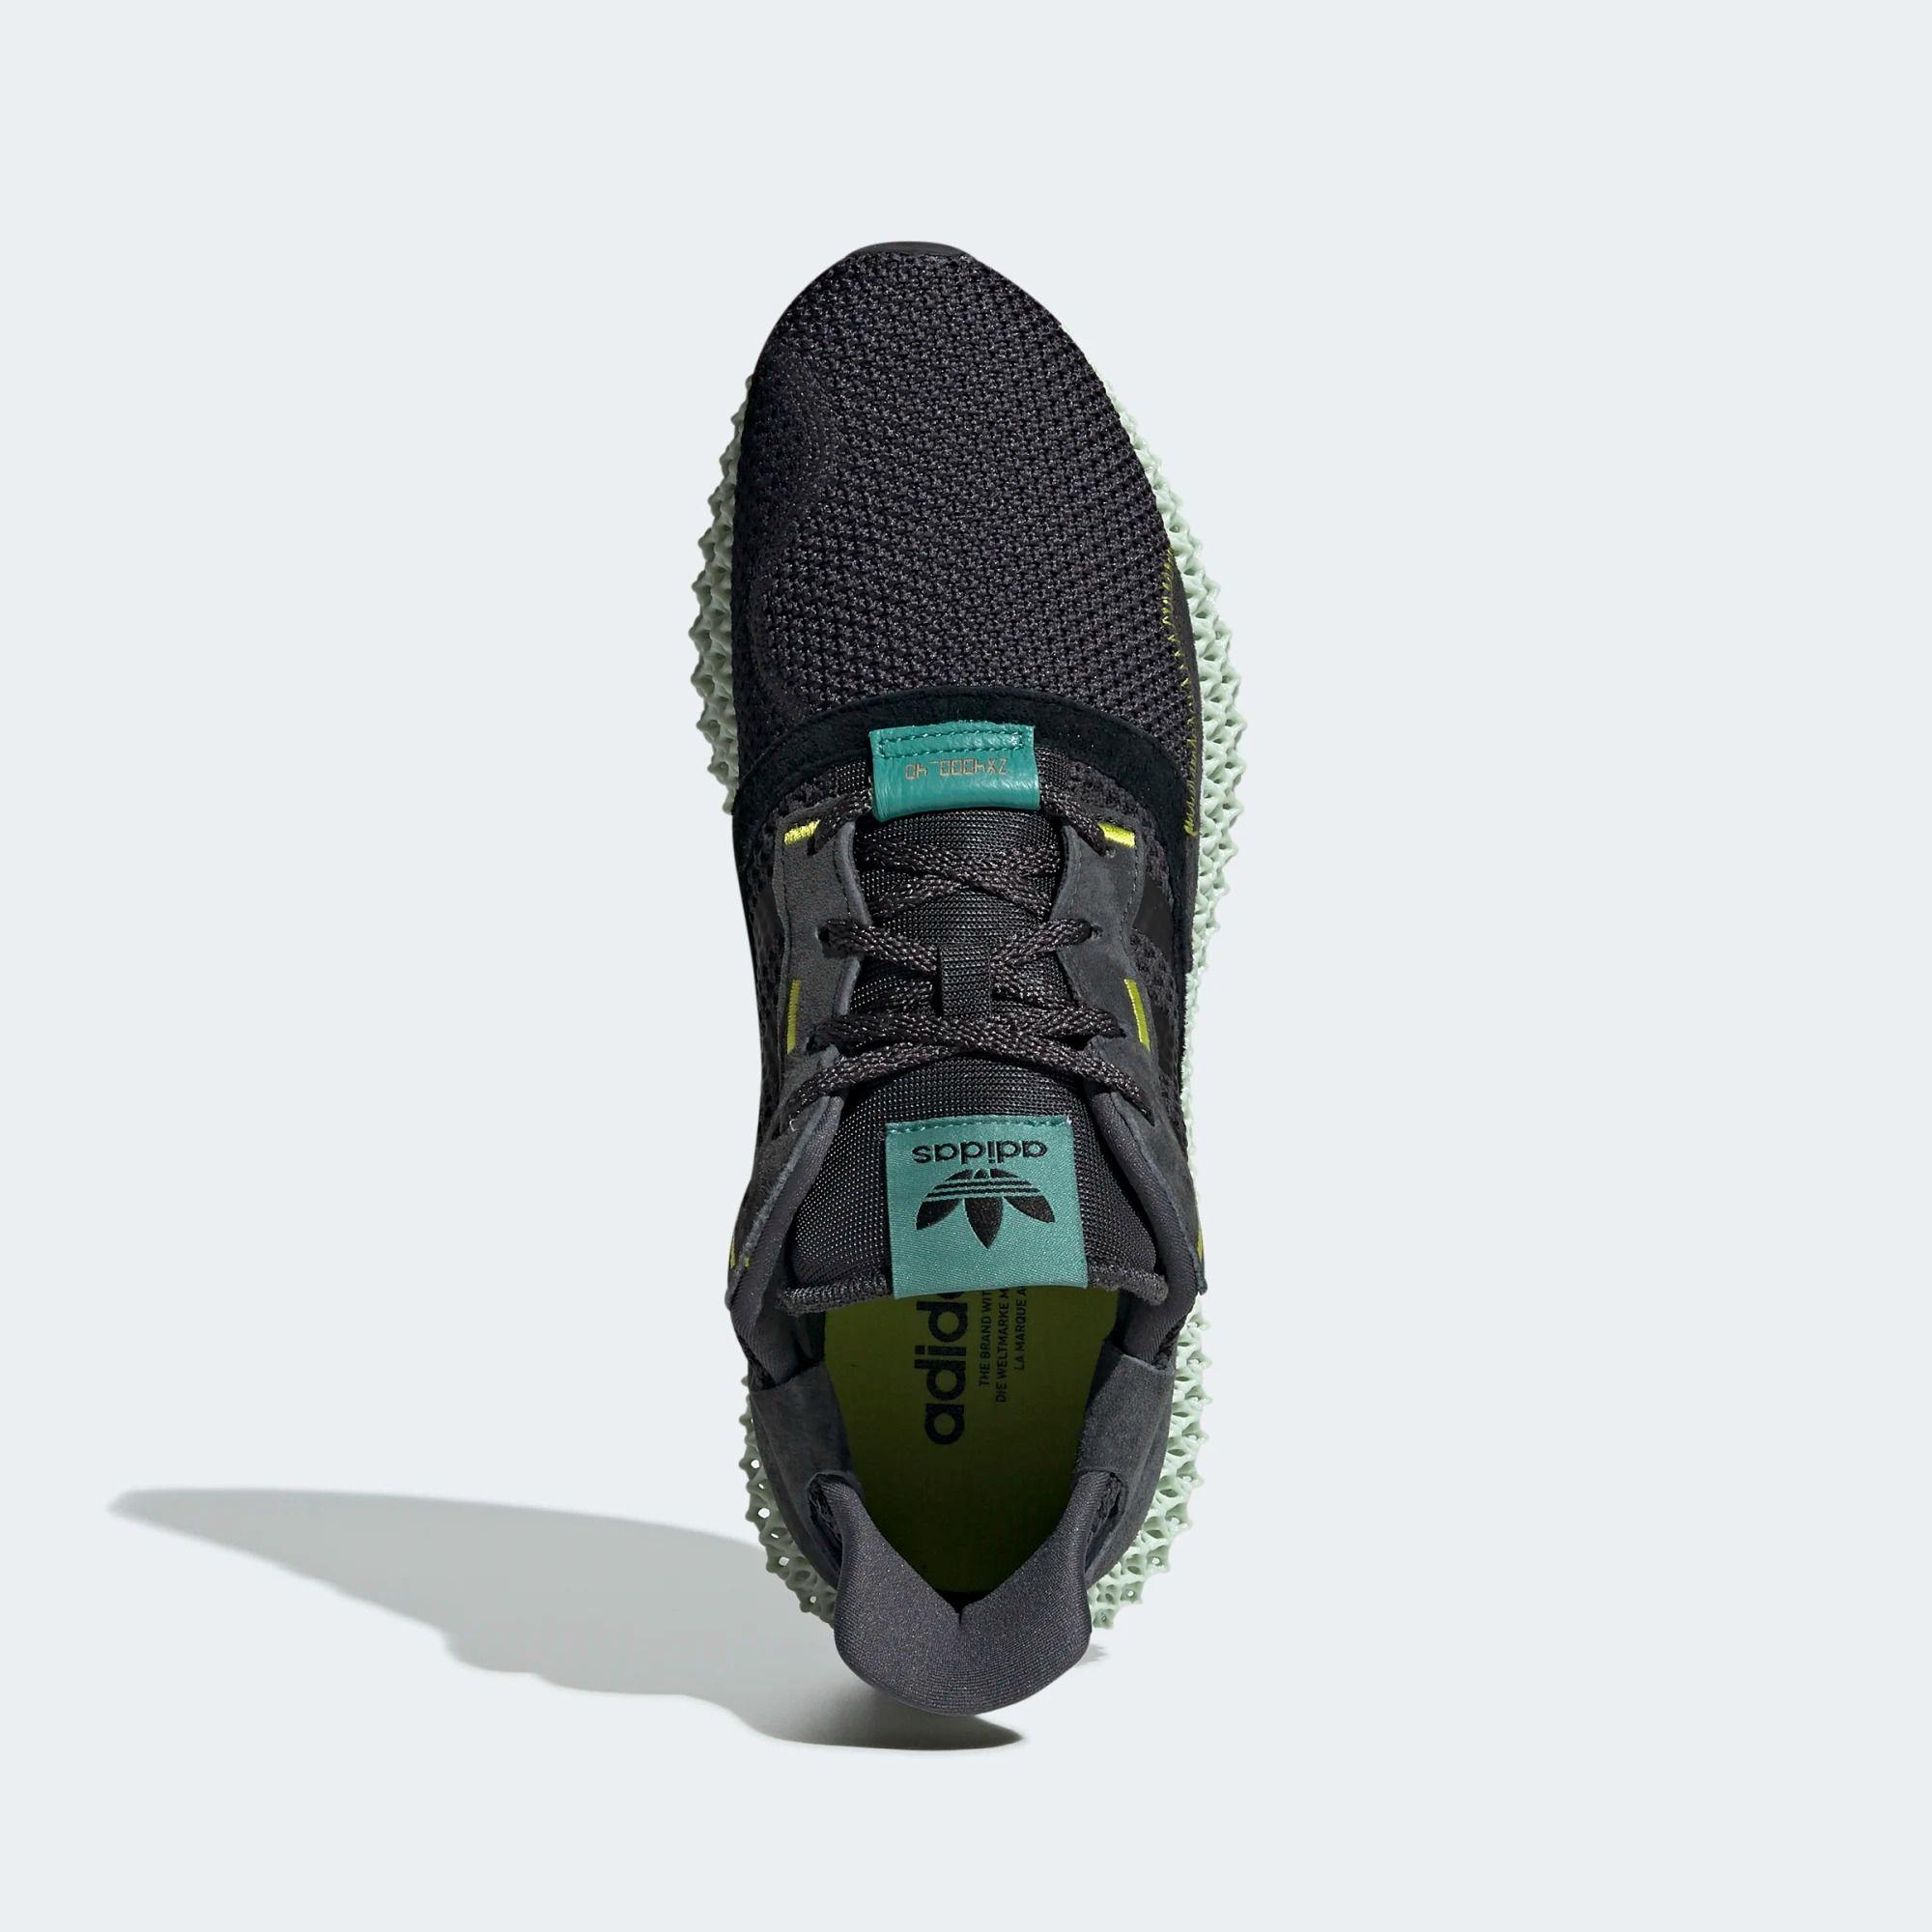 ZXAdidas ZX adidas 4000 und 4D CarbonSneakerAdidas – FK15uJ3Tlc